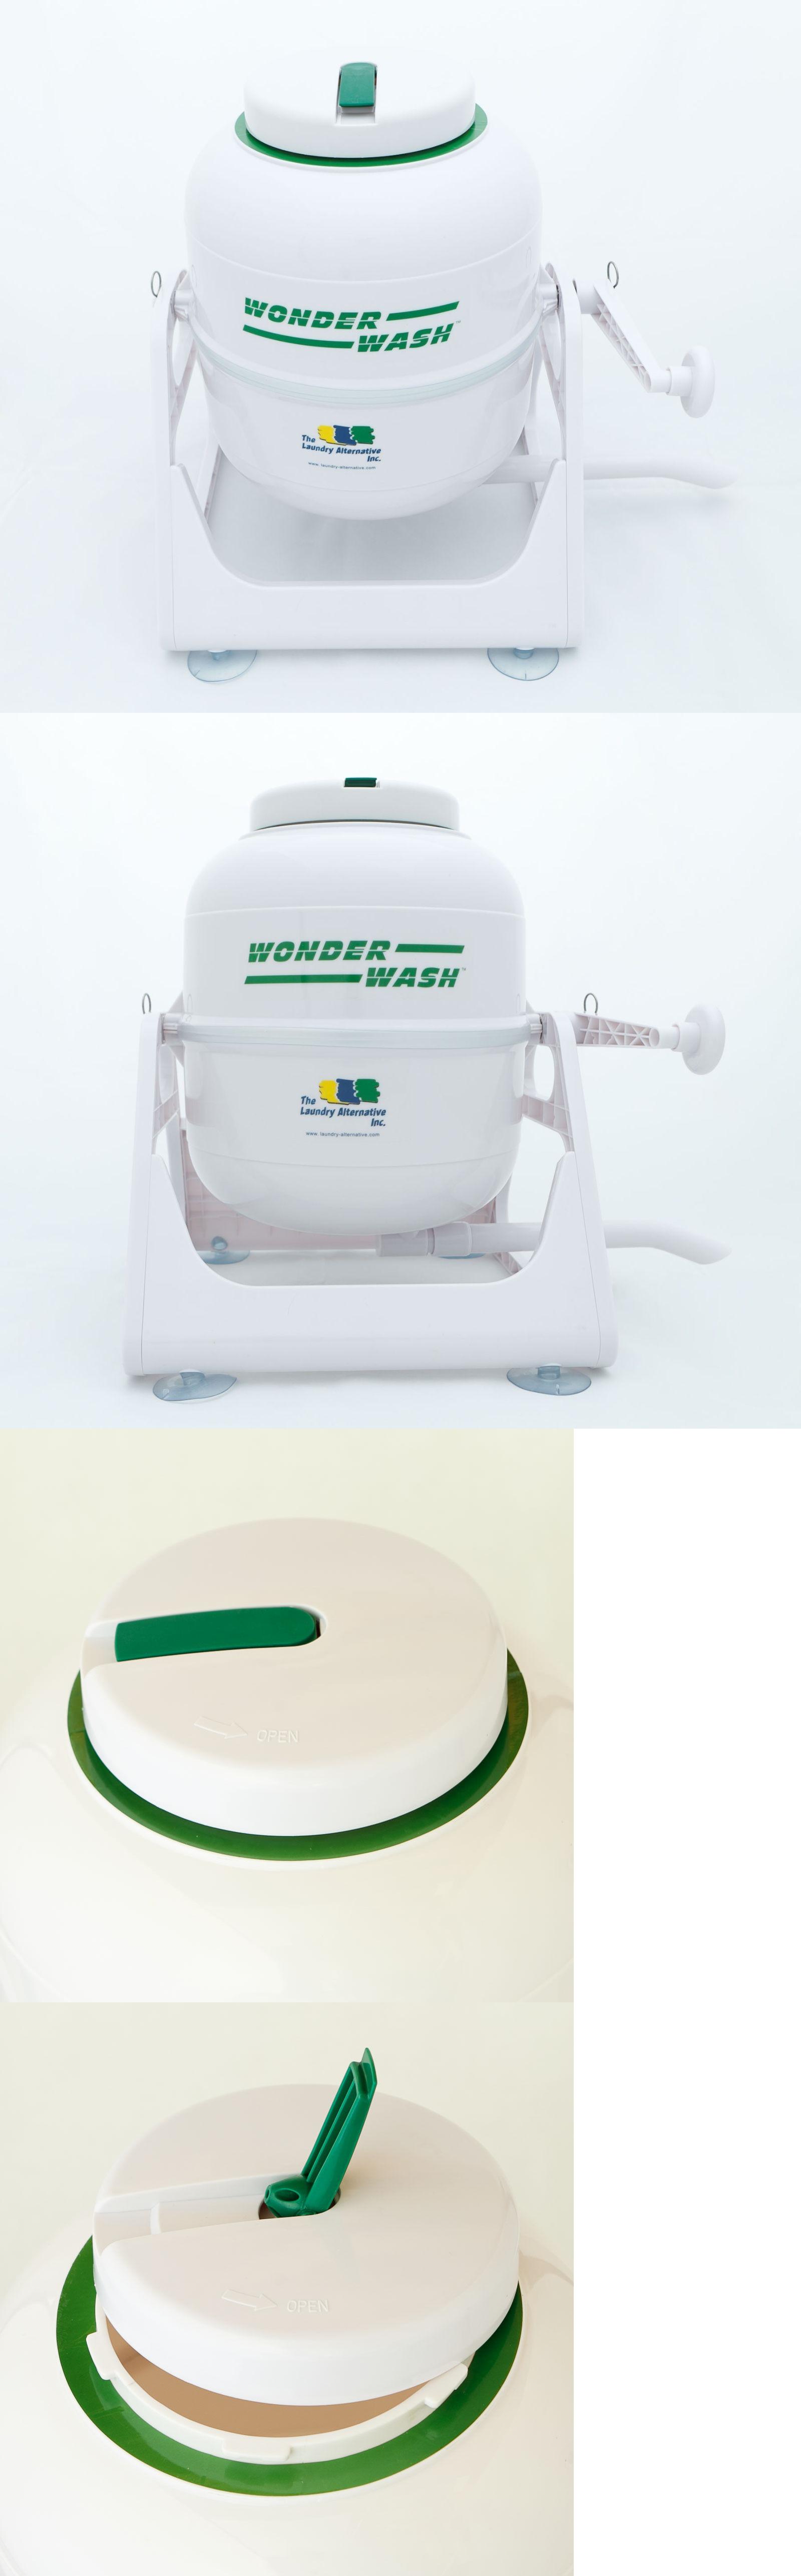 Washing Machines 71256 Mini Portable Compact Non Electric Wonder Washing Machine Laundry Alter Laundry Alternative Clothes Washer Washer Dryer Combo